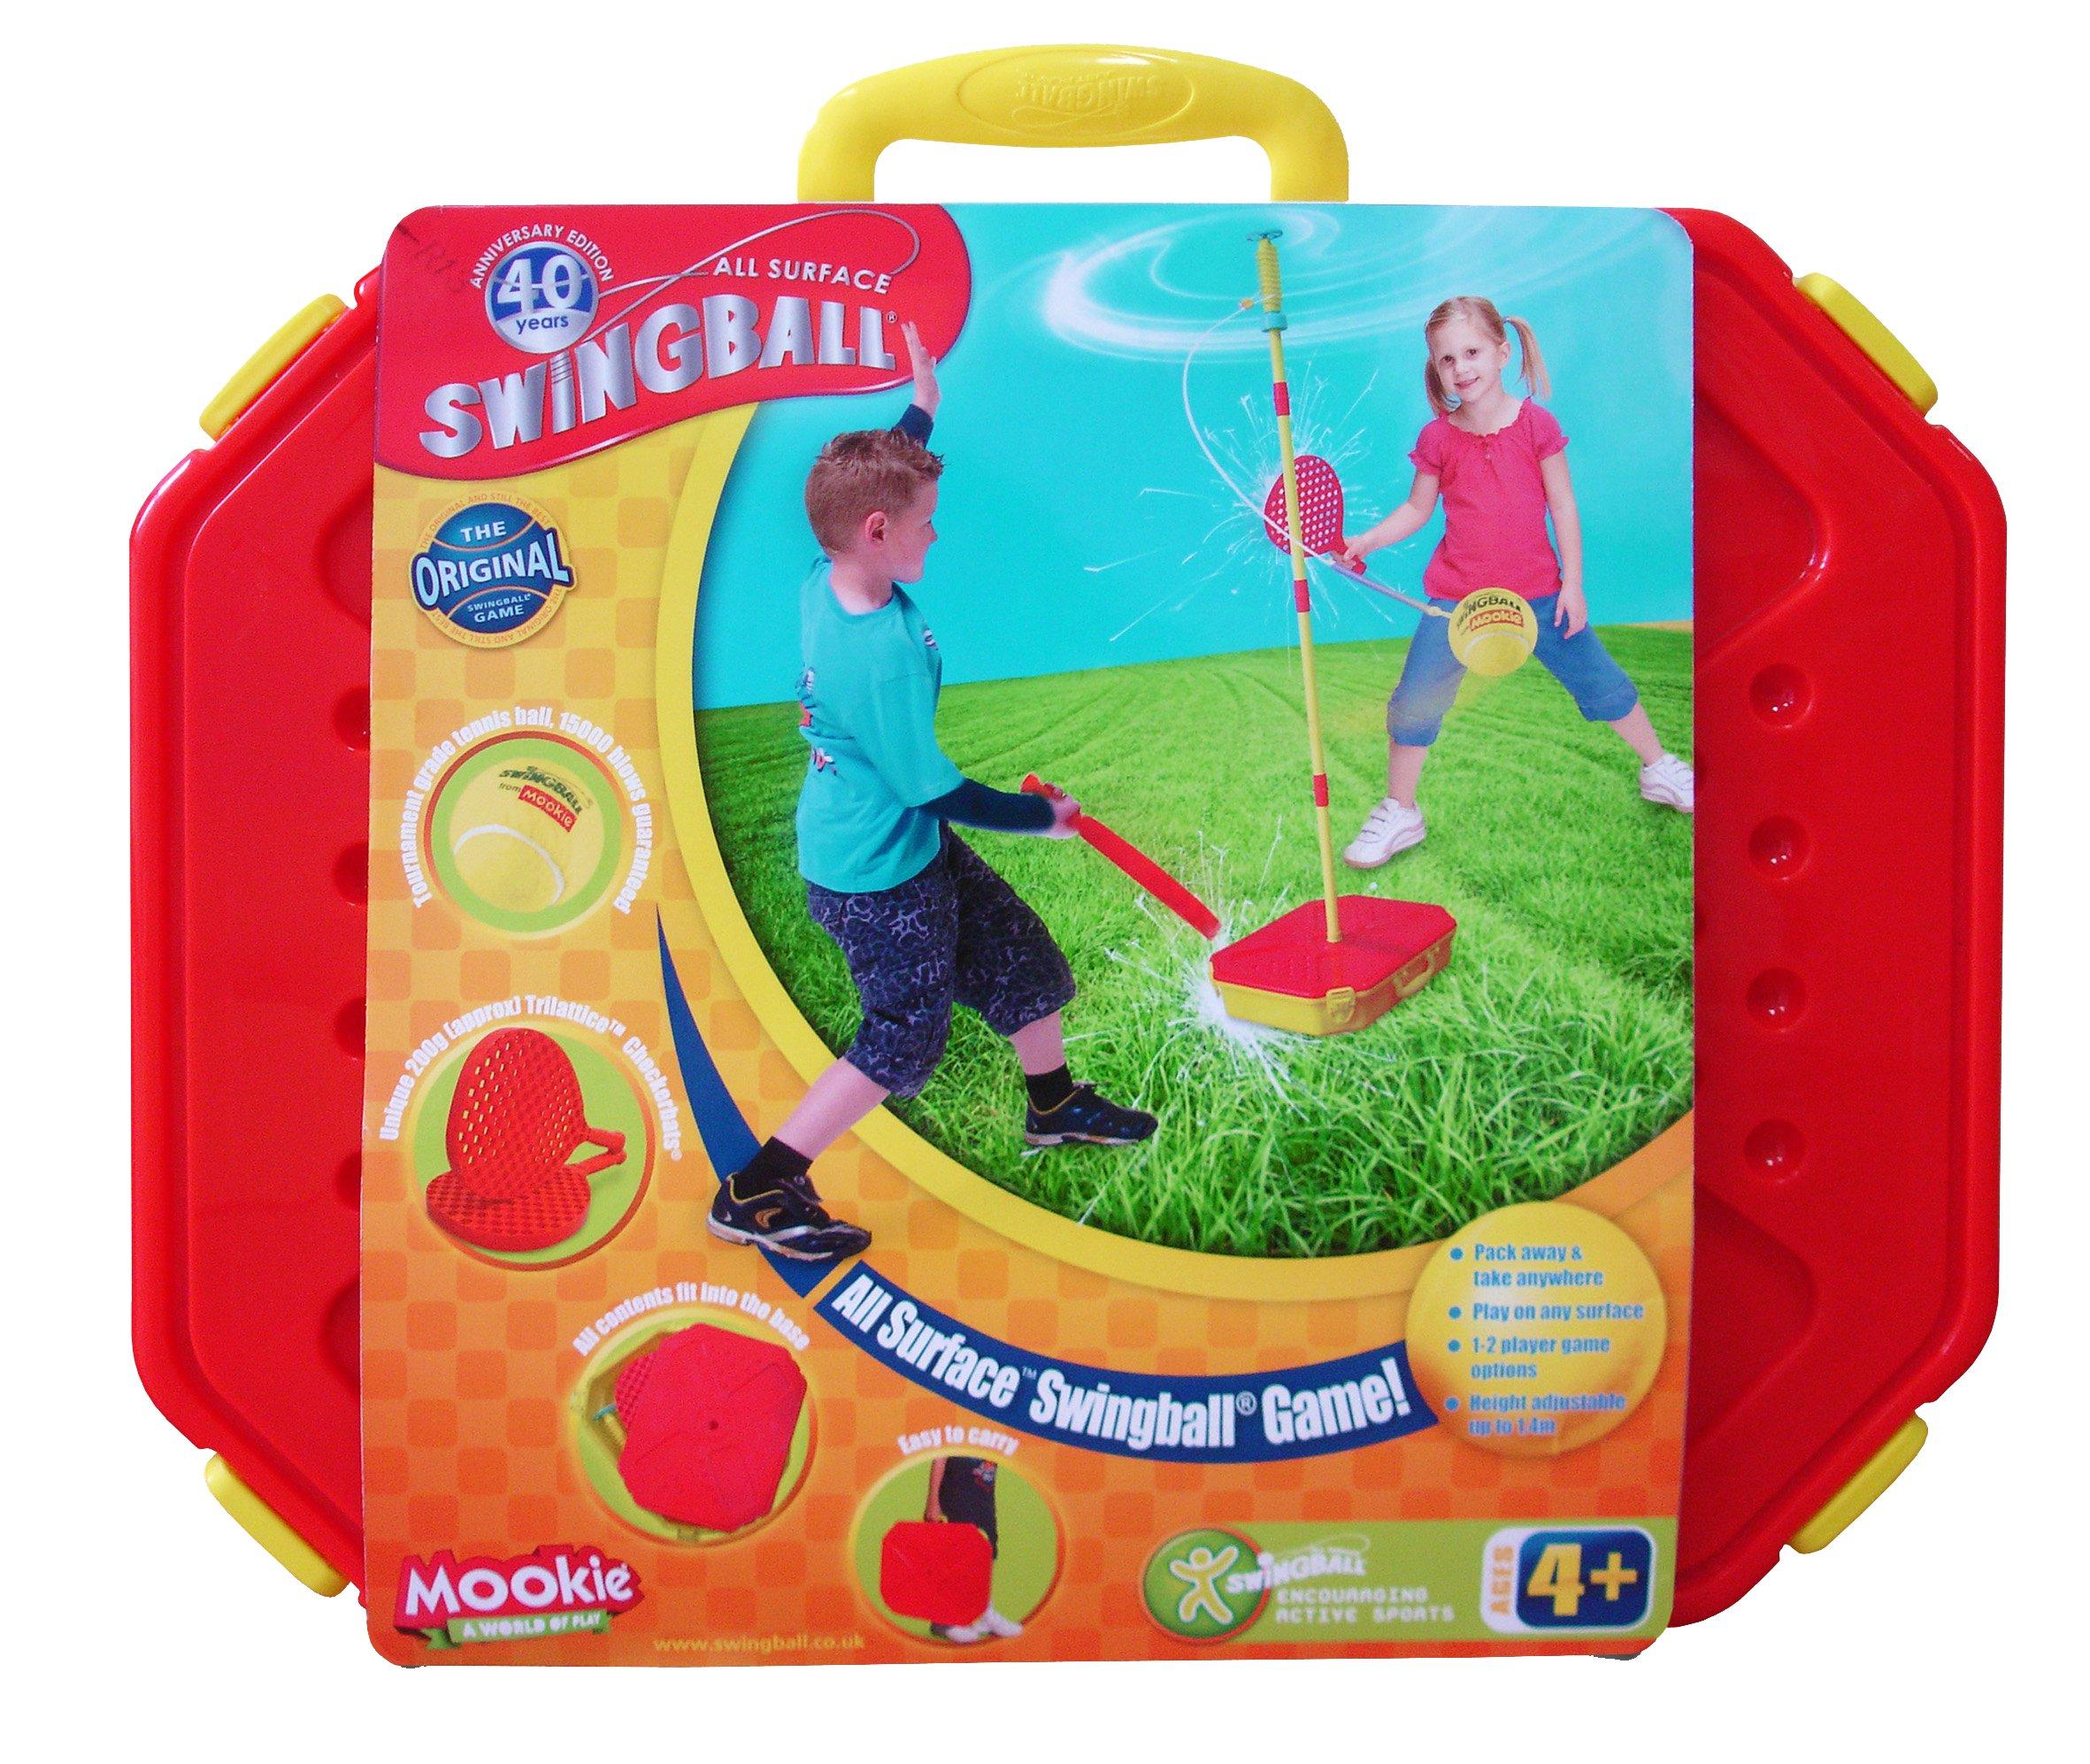 Mookie Classic Swingball Tetherball Set - Portable Tetherball by Mookie Swingball